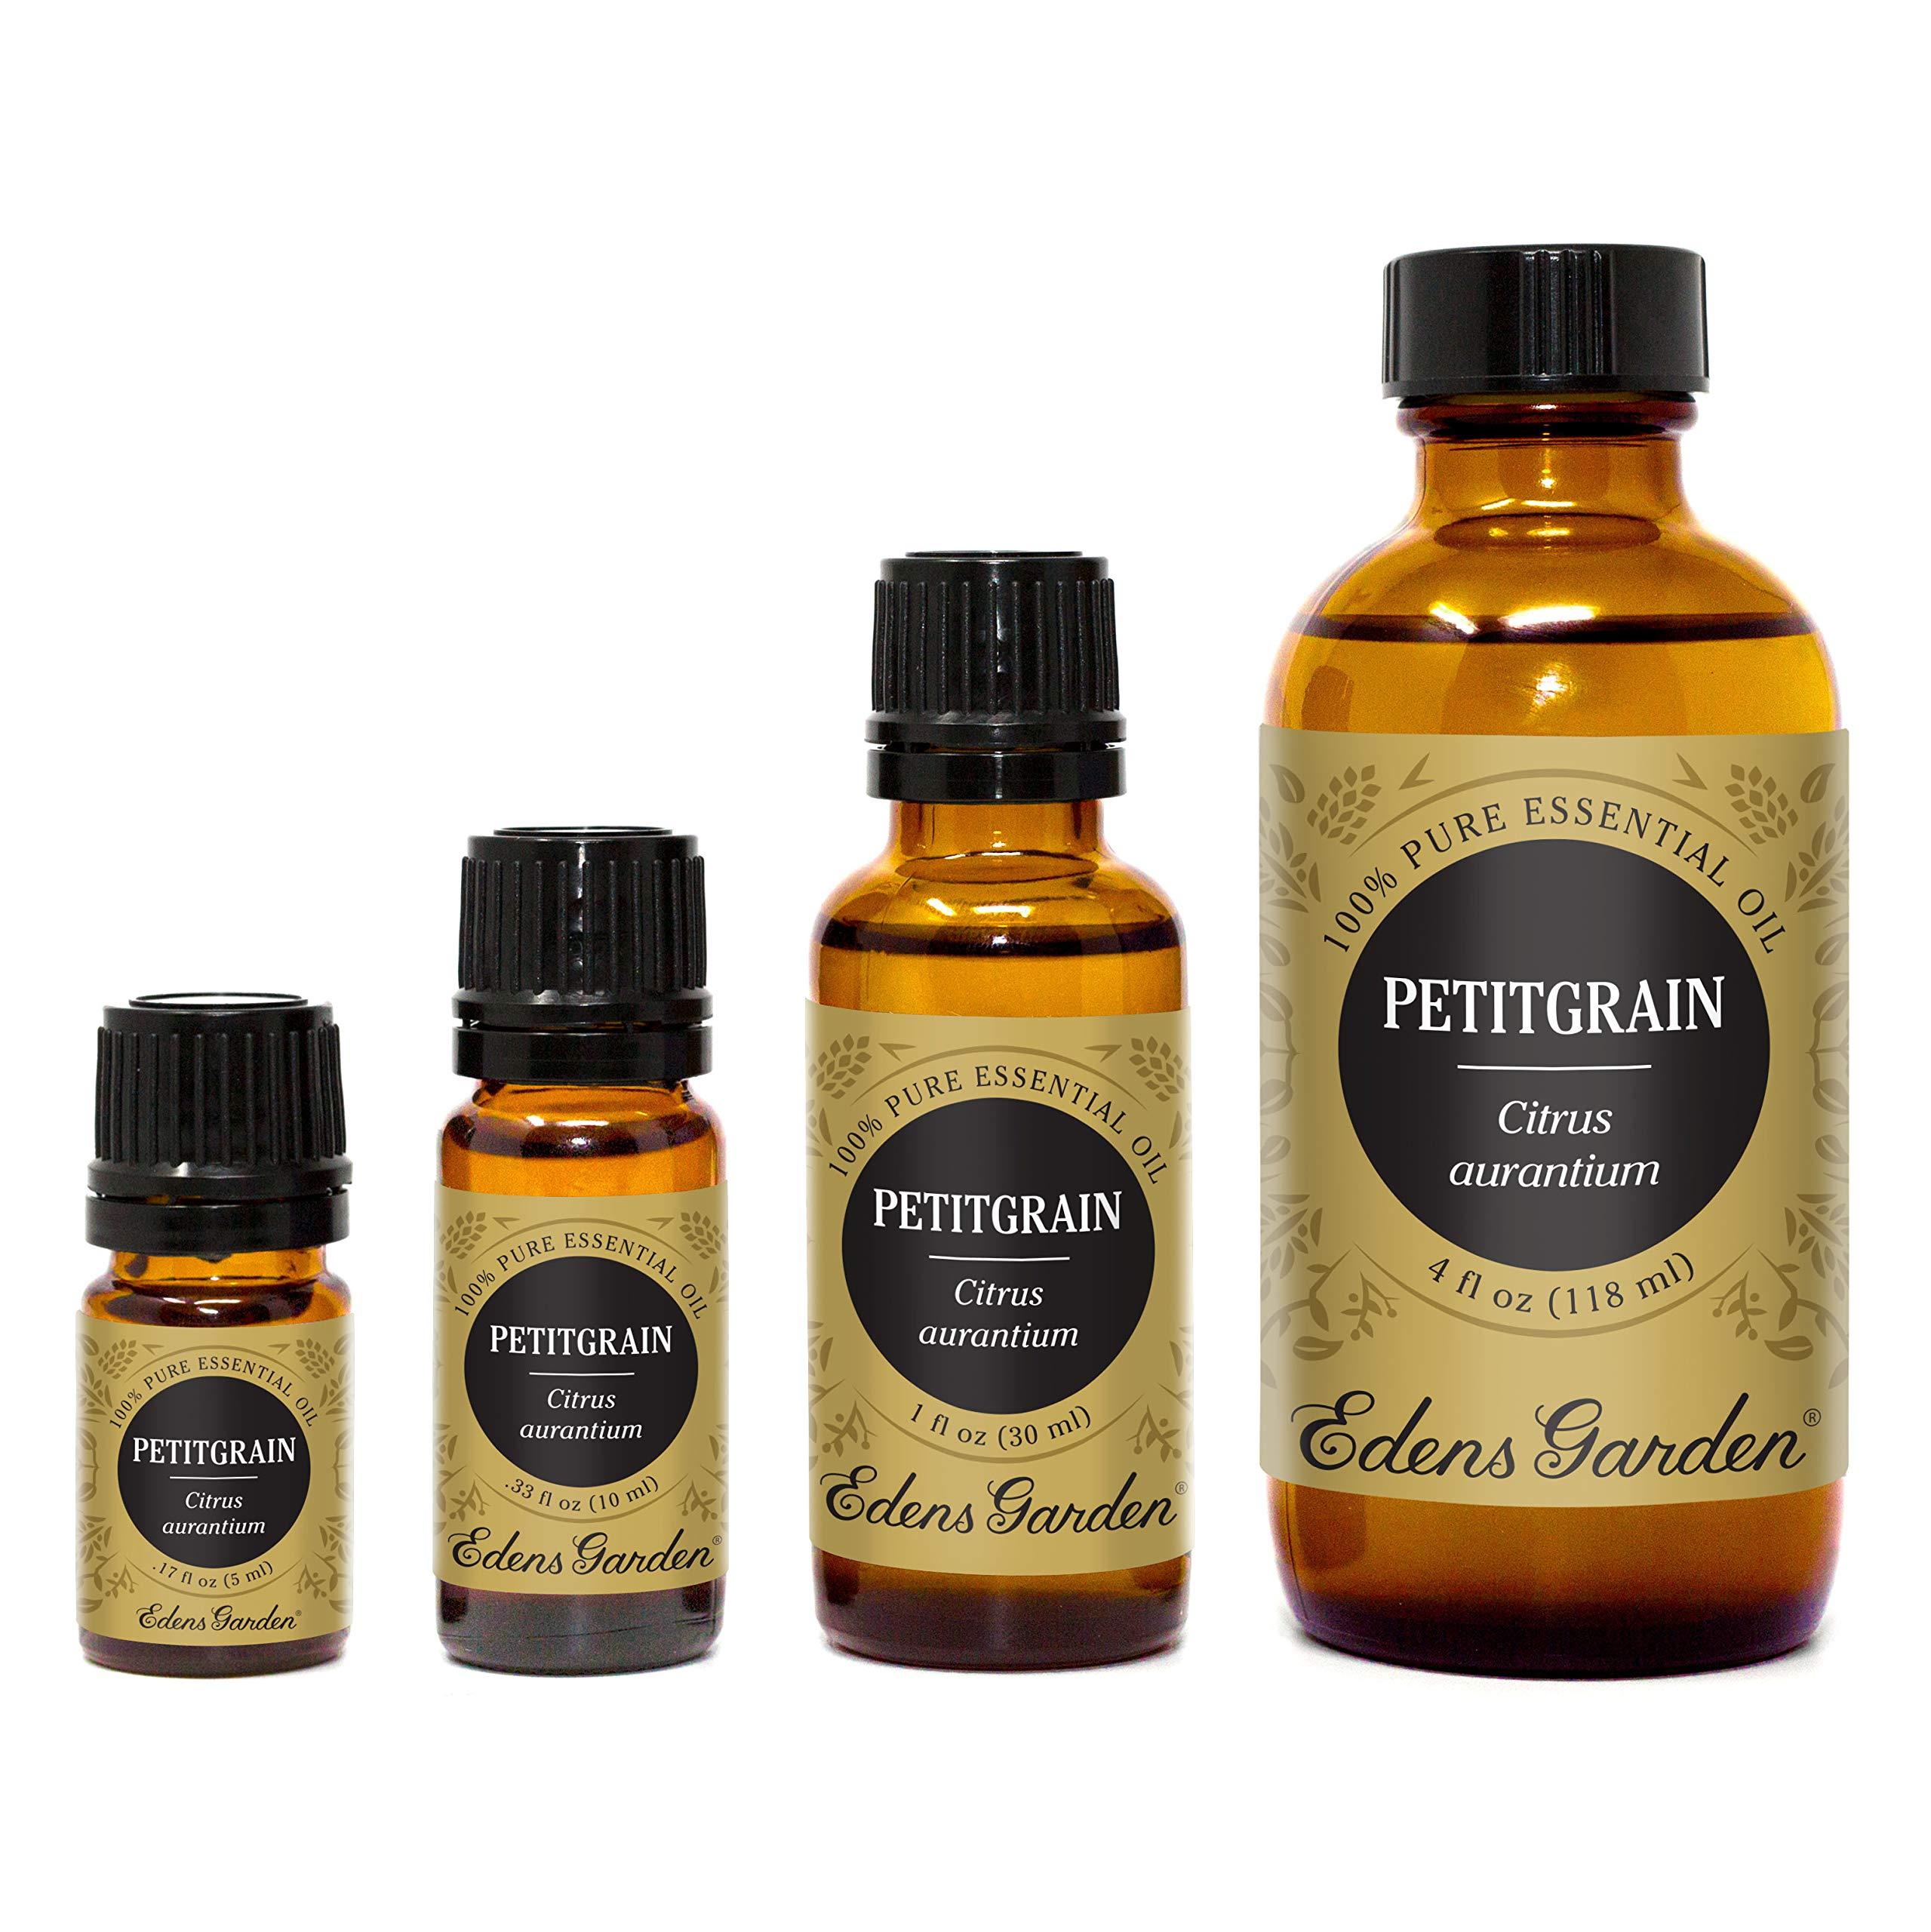 Edens Garden Petitgrain 30 ml 100% Pure Undiluted Therapeutic Grade Essential Oil GC/MS Tested